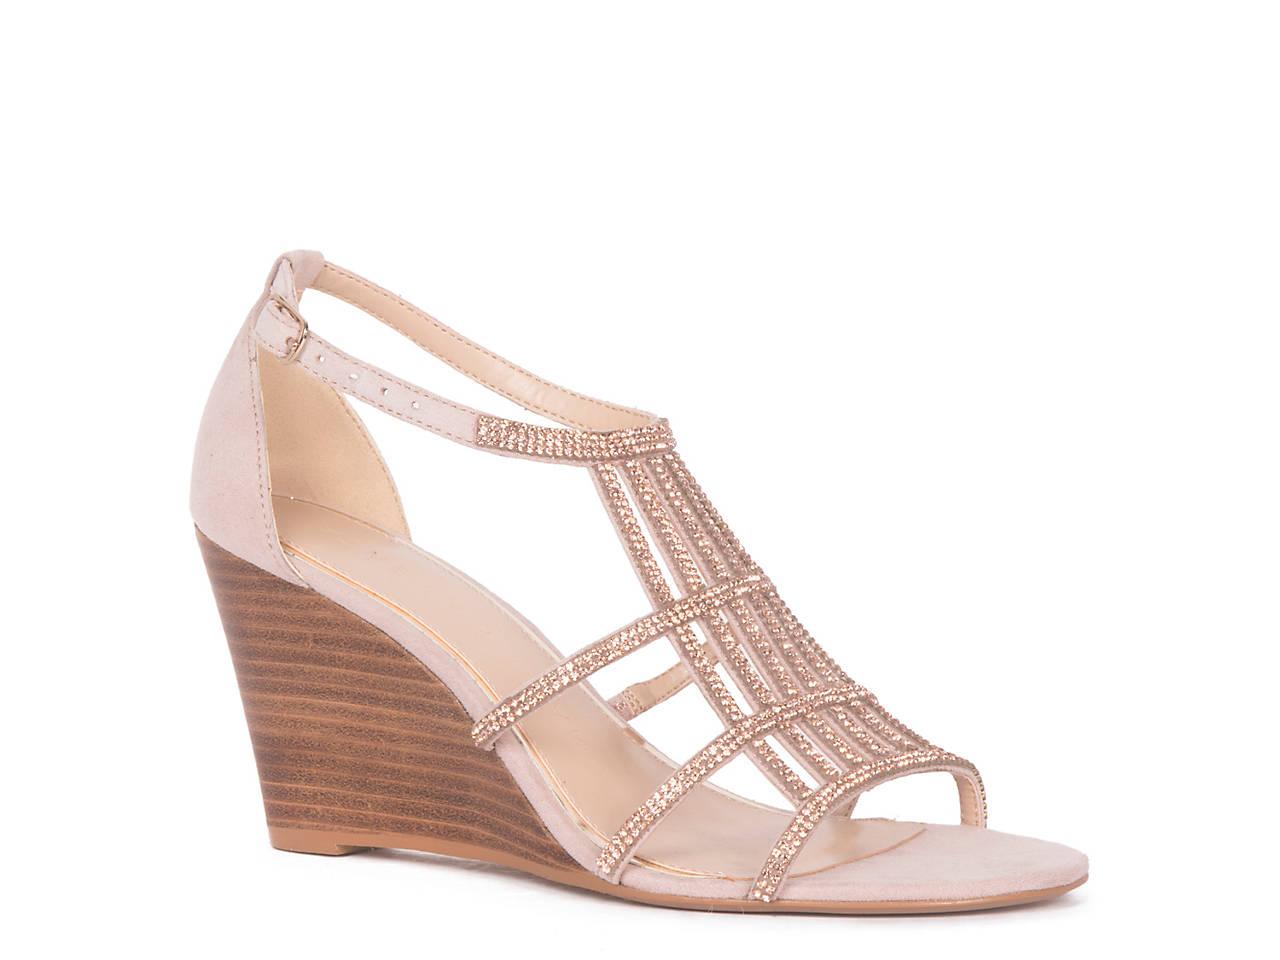 a2c7895d5 Athena Alexander Hampton Wedge Sandal Women s Shoes